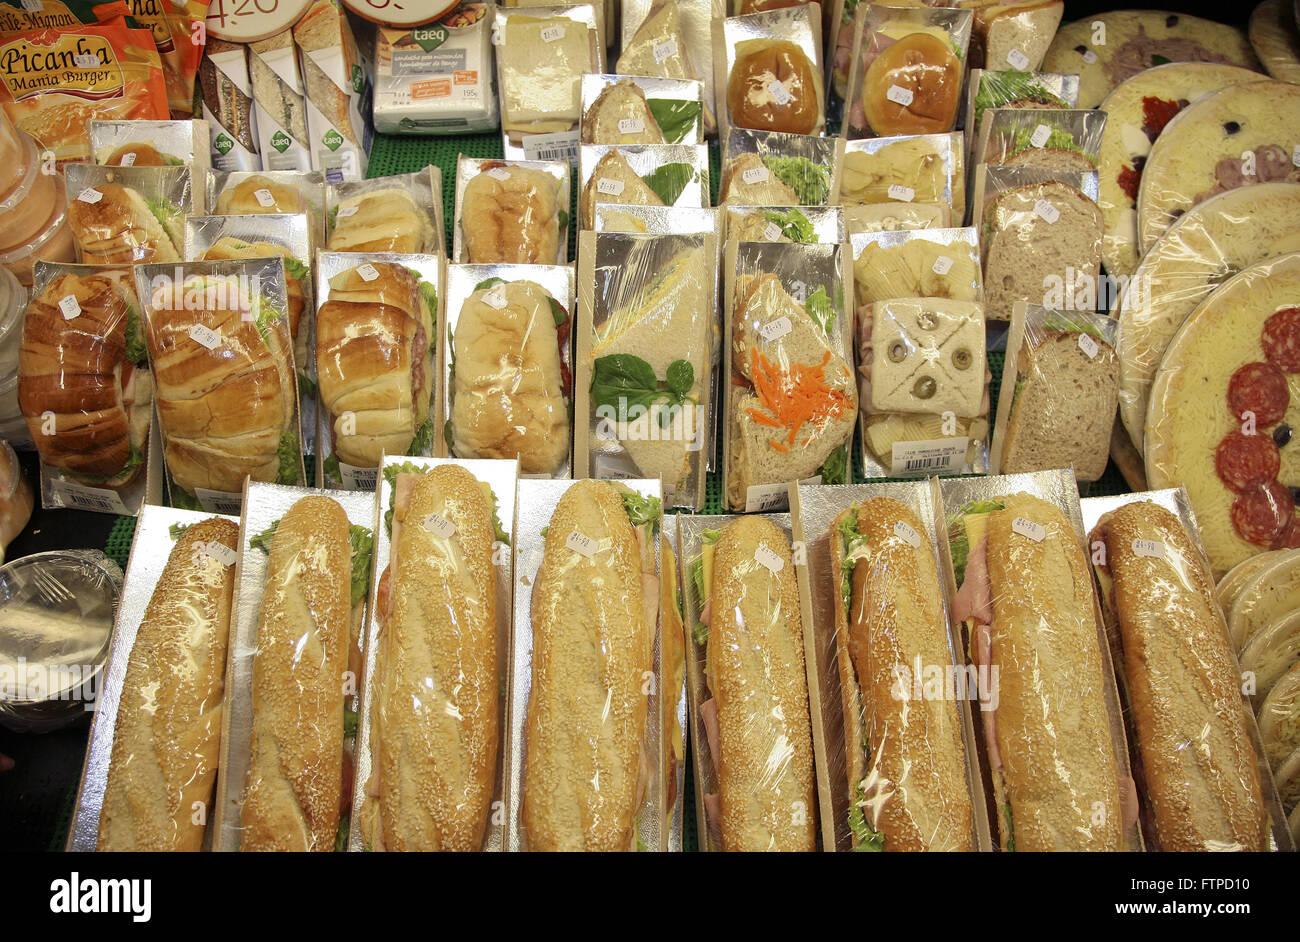 Sandwiches in Lebensmittelgeschäften verkauft Stockbild